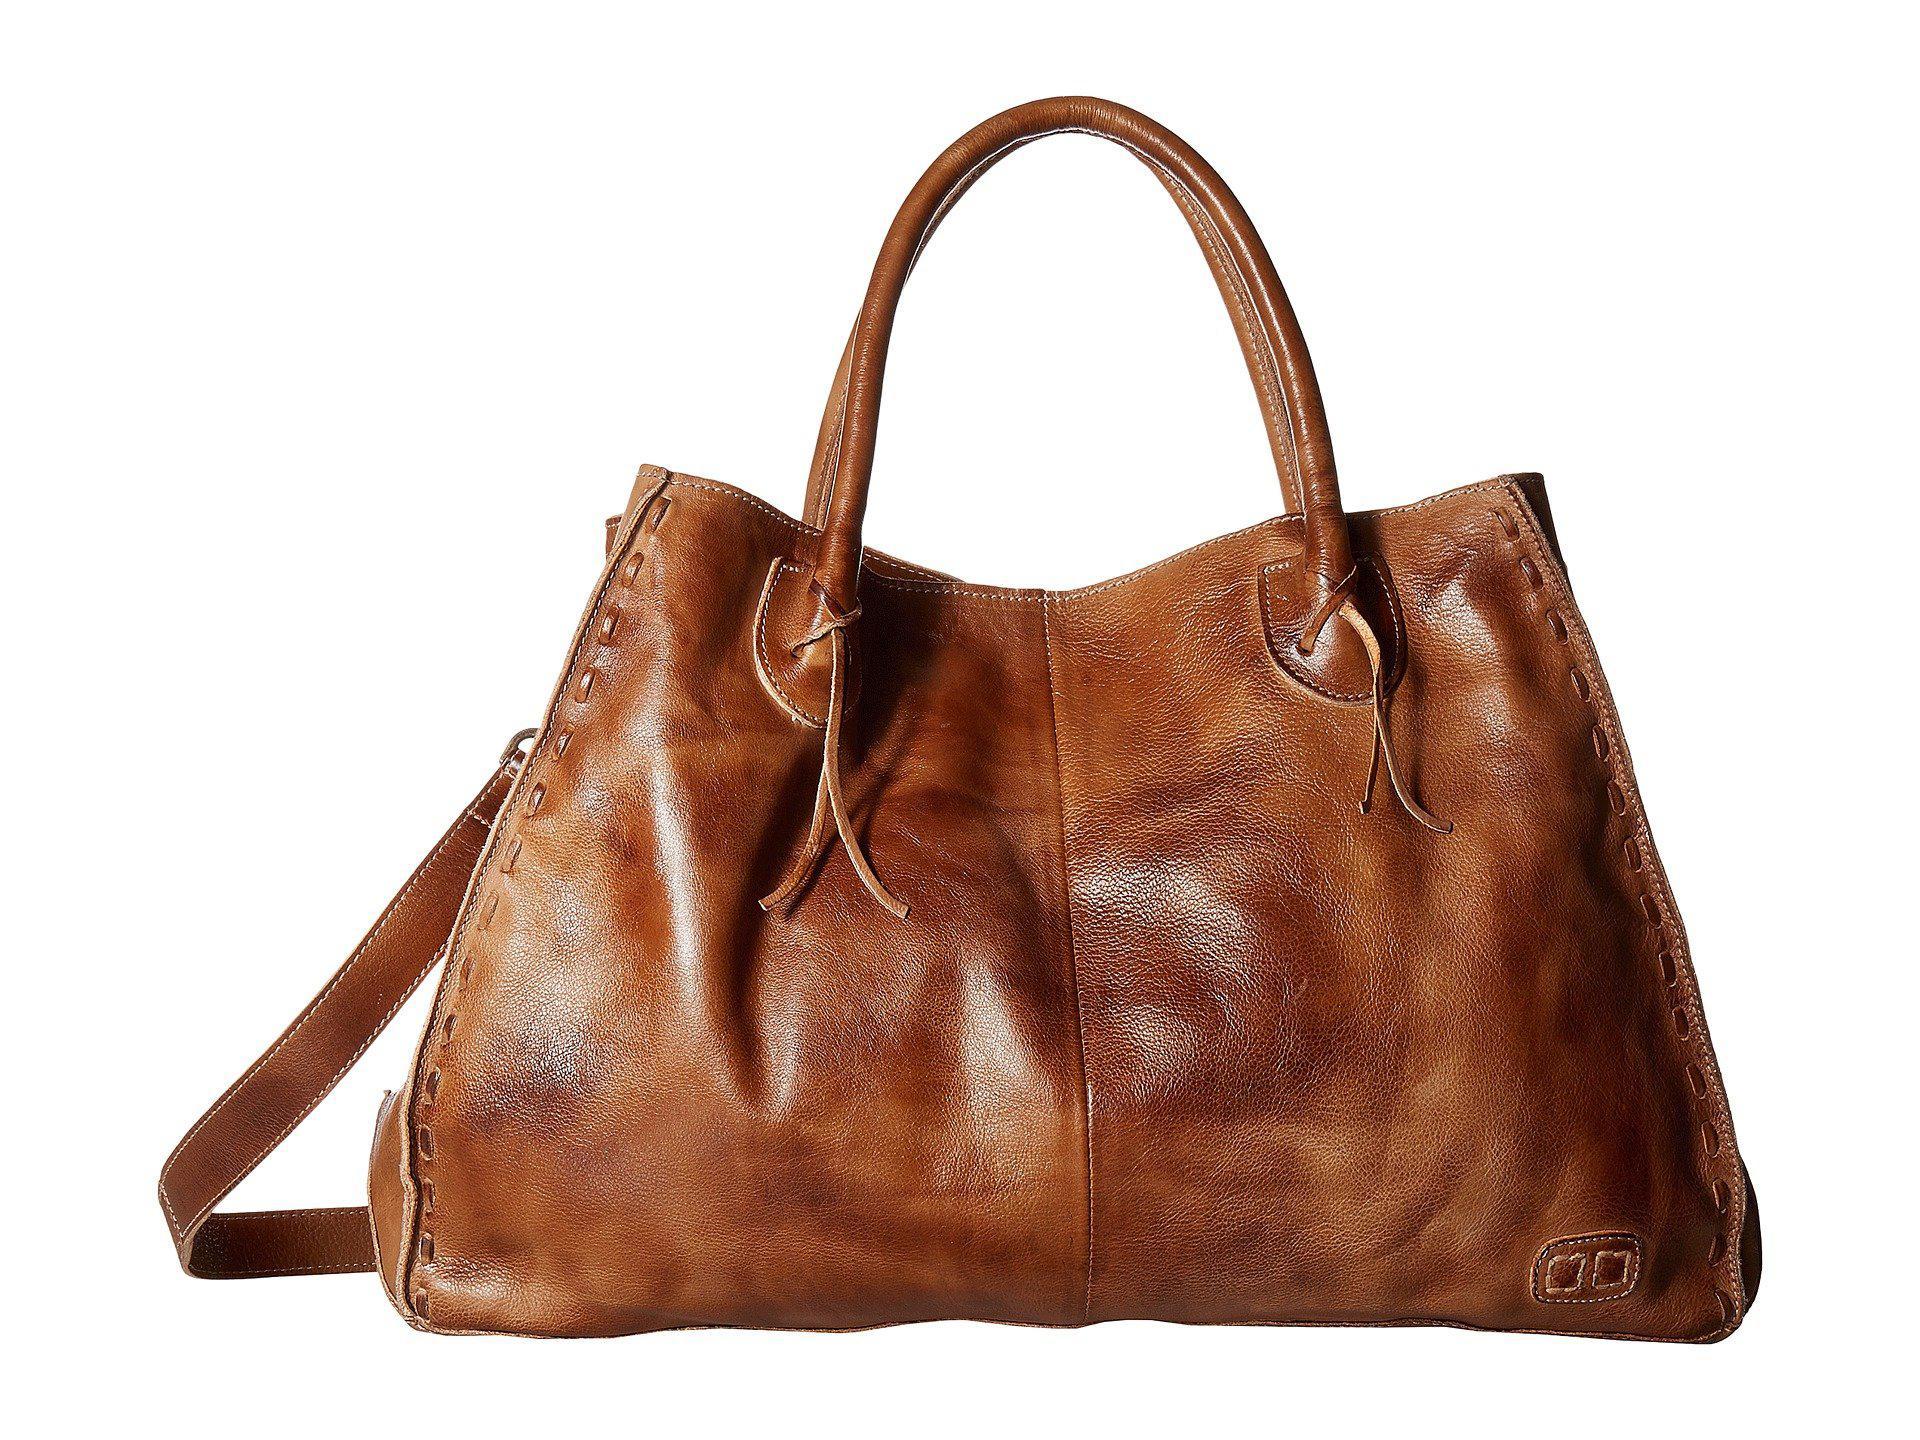 61ed50e19a45 Lyst - Bed Stu Rockaway (tan Rustic) Handbags in Brown